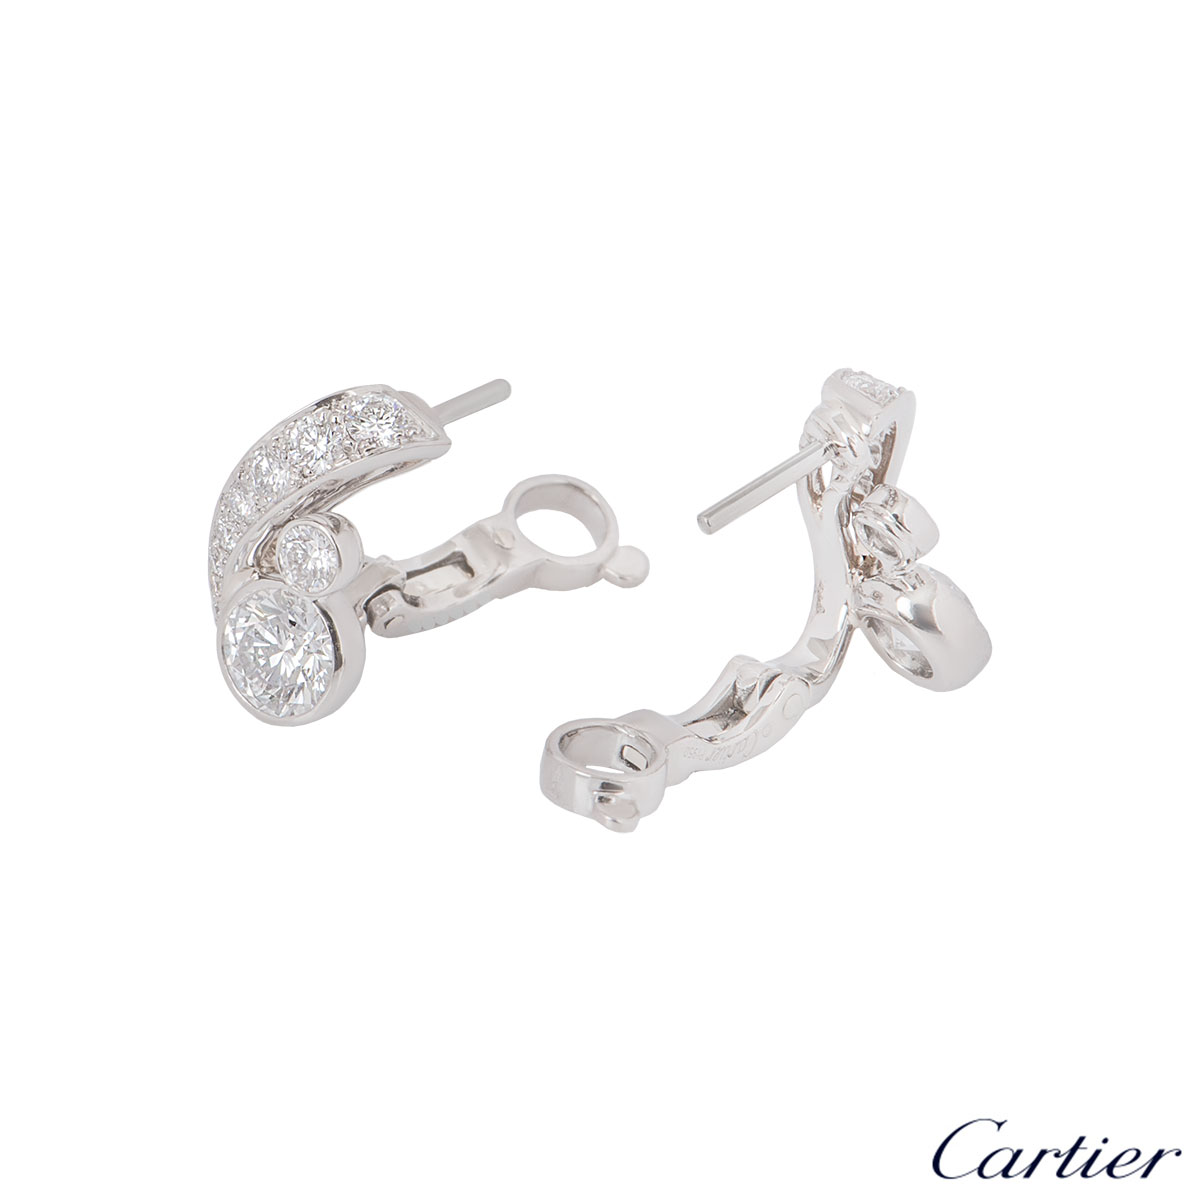 Cartier Platinum Diamond Earrings